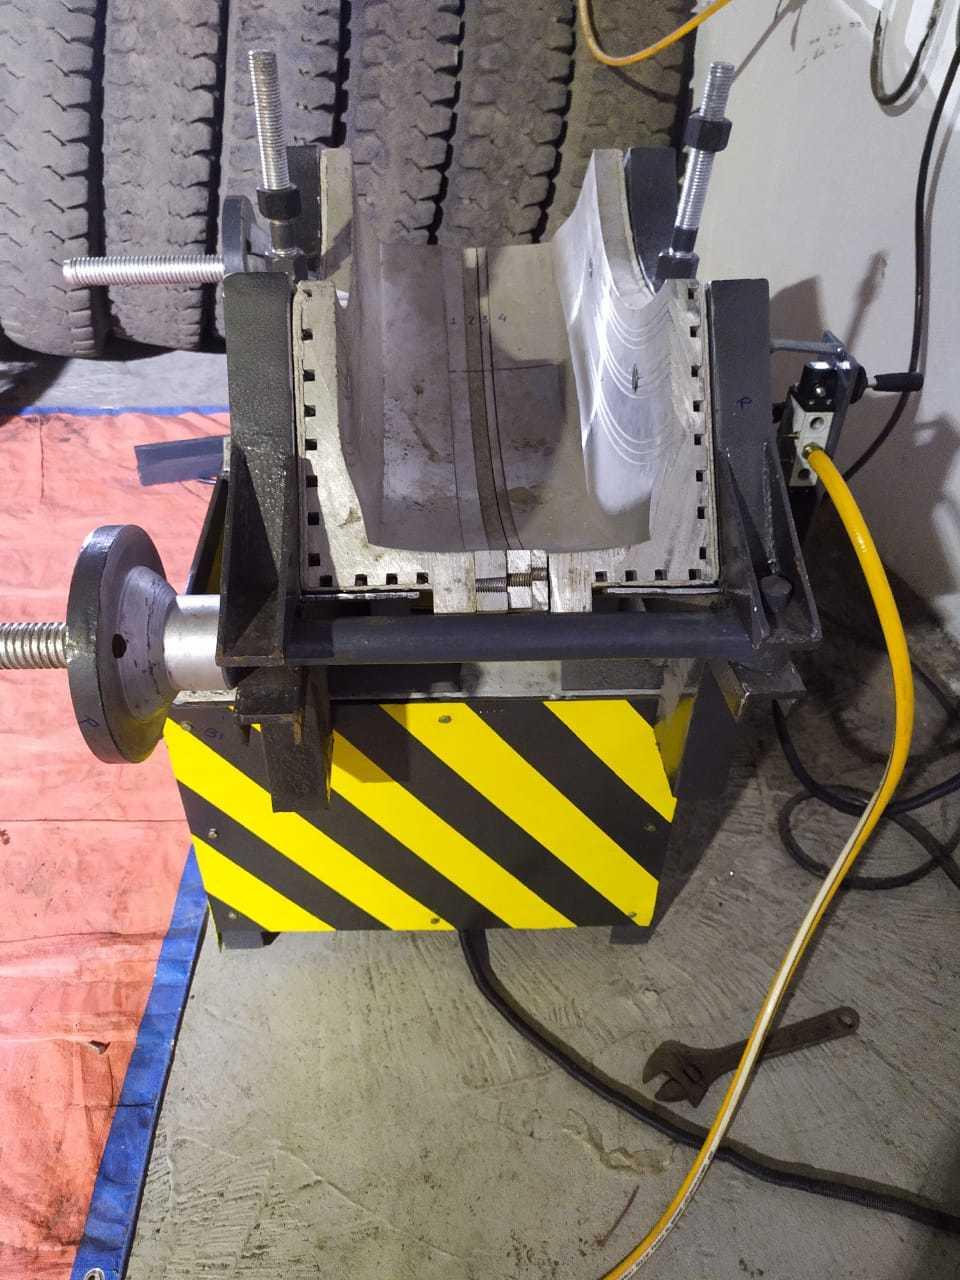 TYRE CUT REPAIR MACHINE ELECTRIC